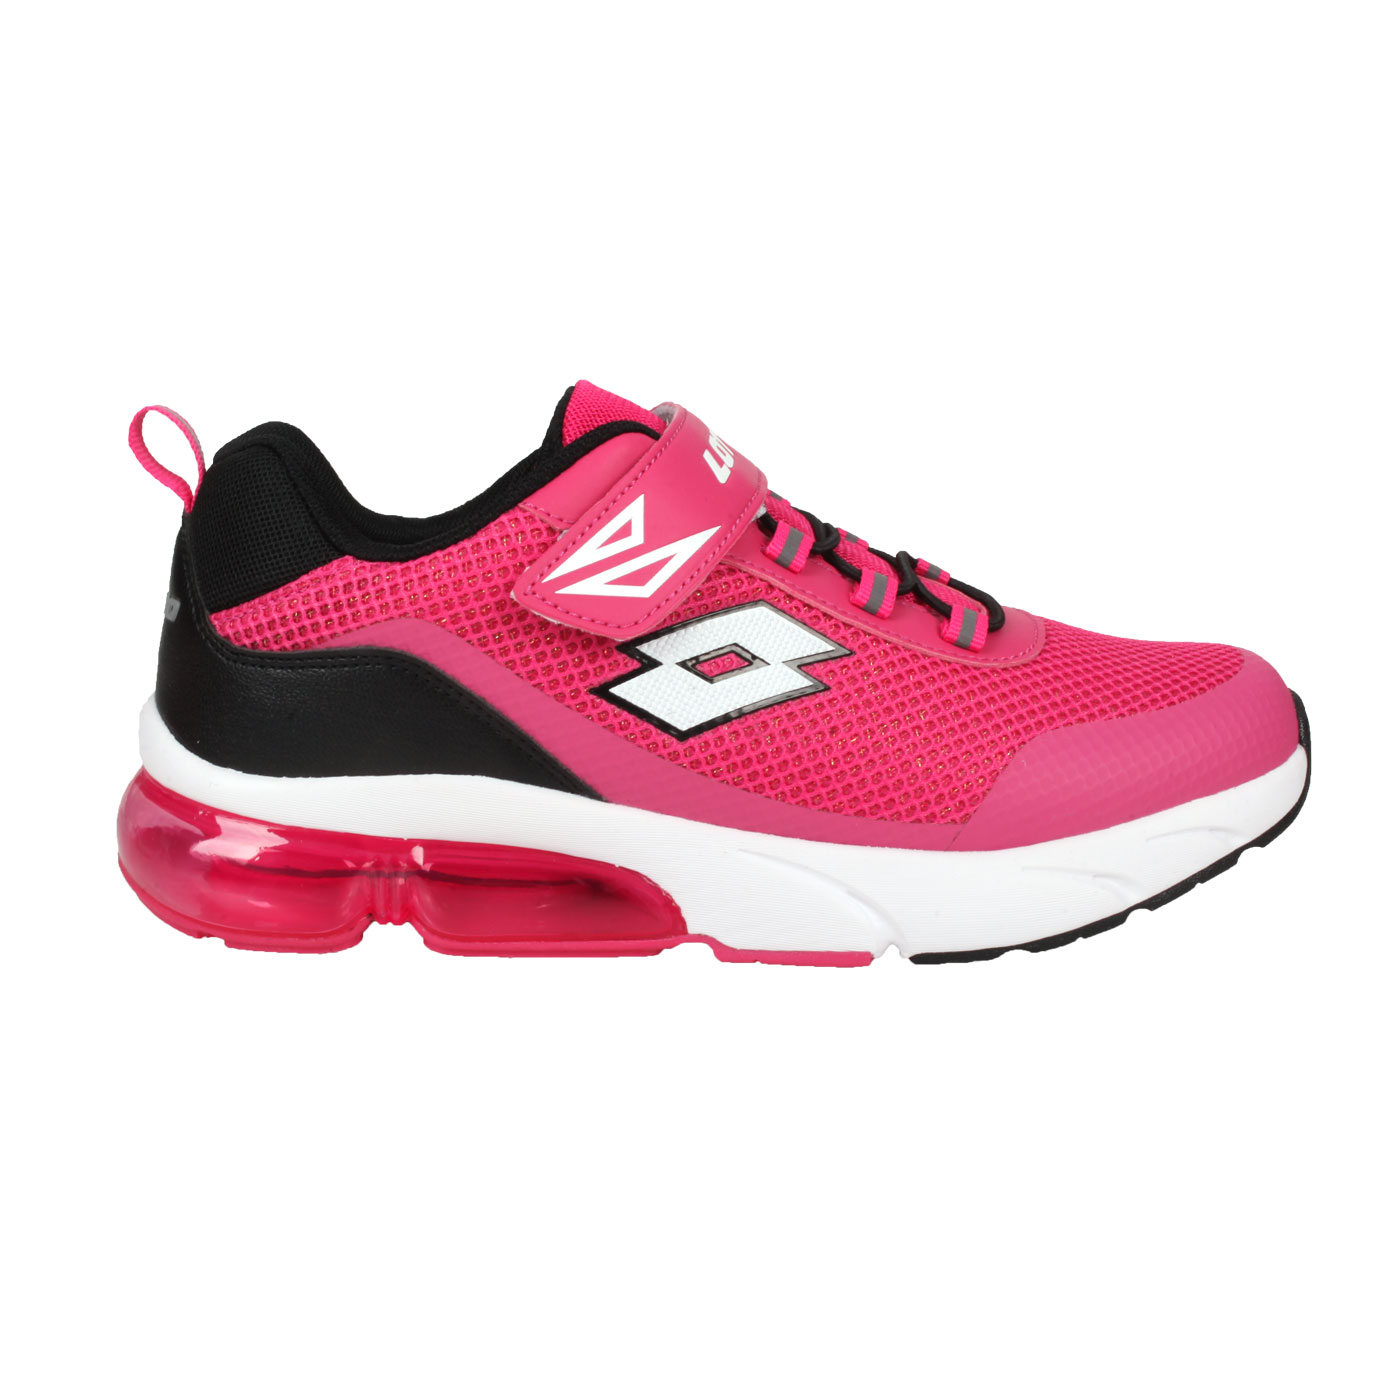 LOTTO 女款閃耀氣墊跑鞋 LT1AKR3073 - 桃紅黑